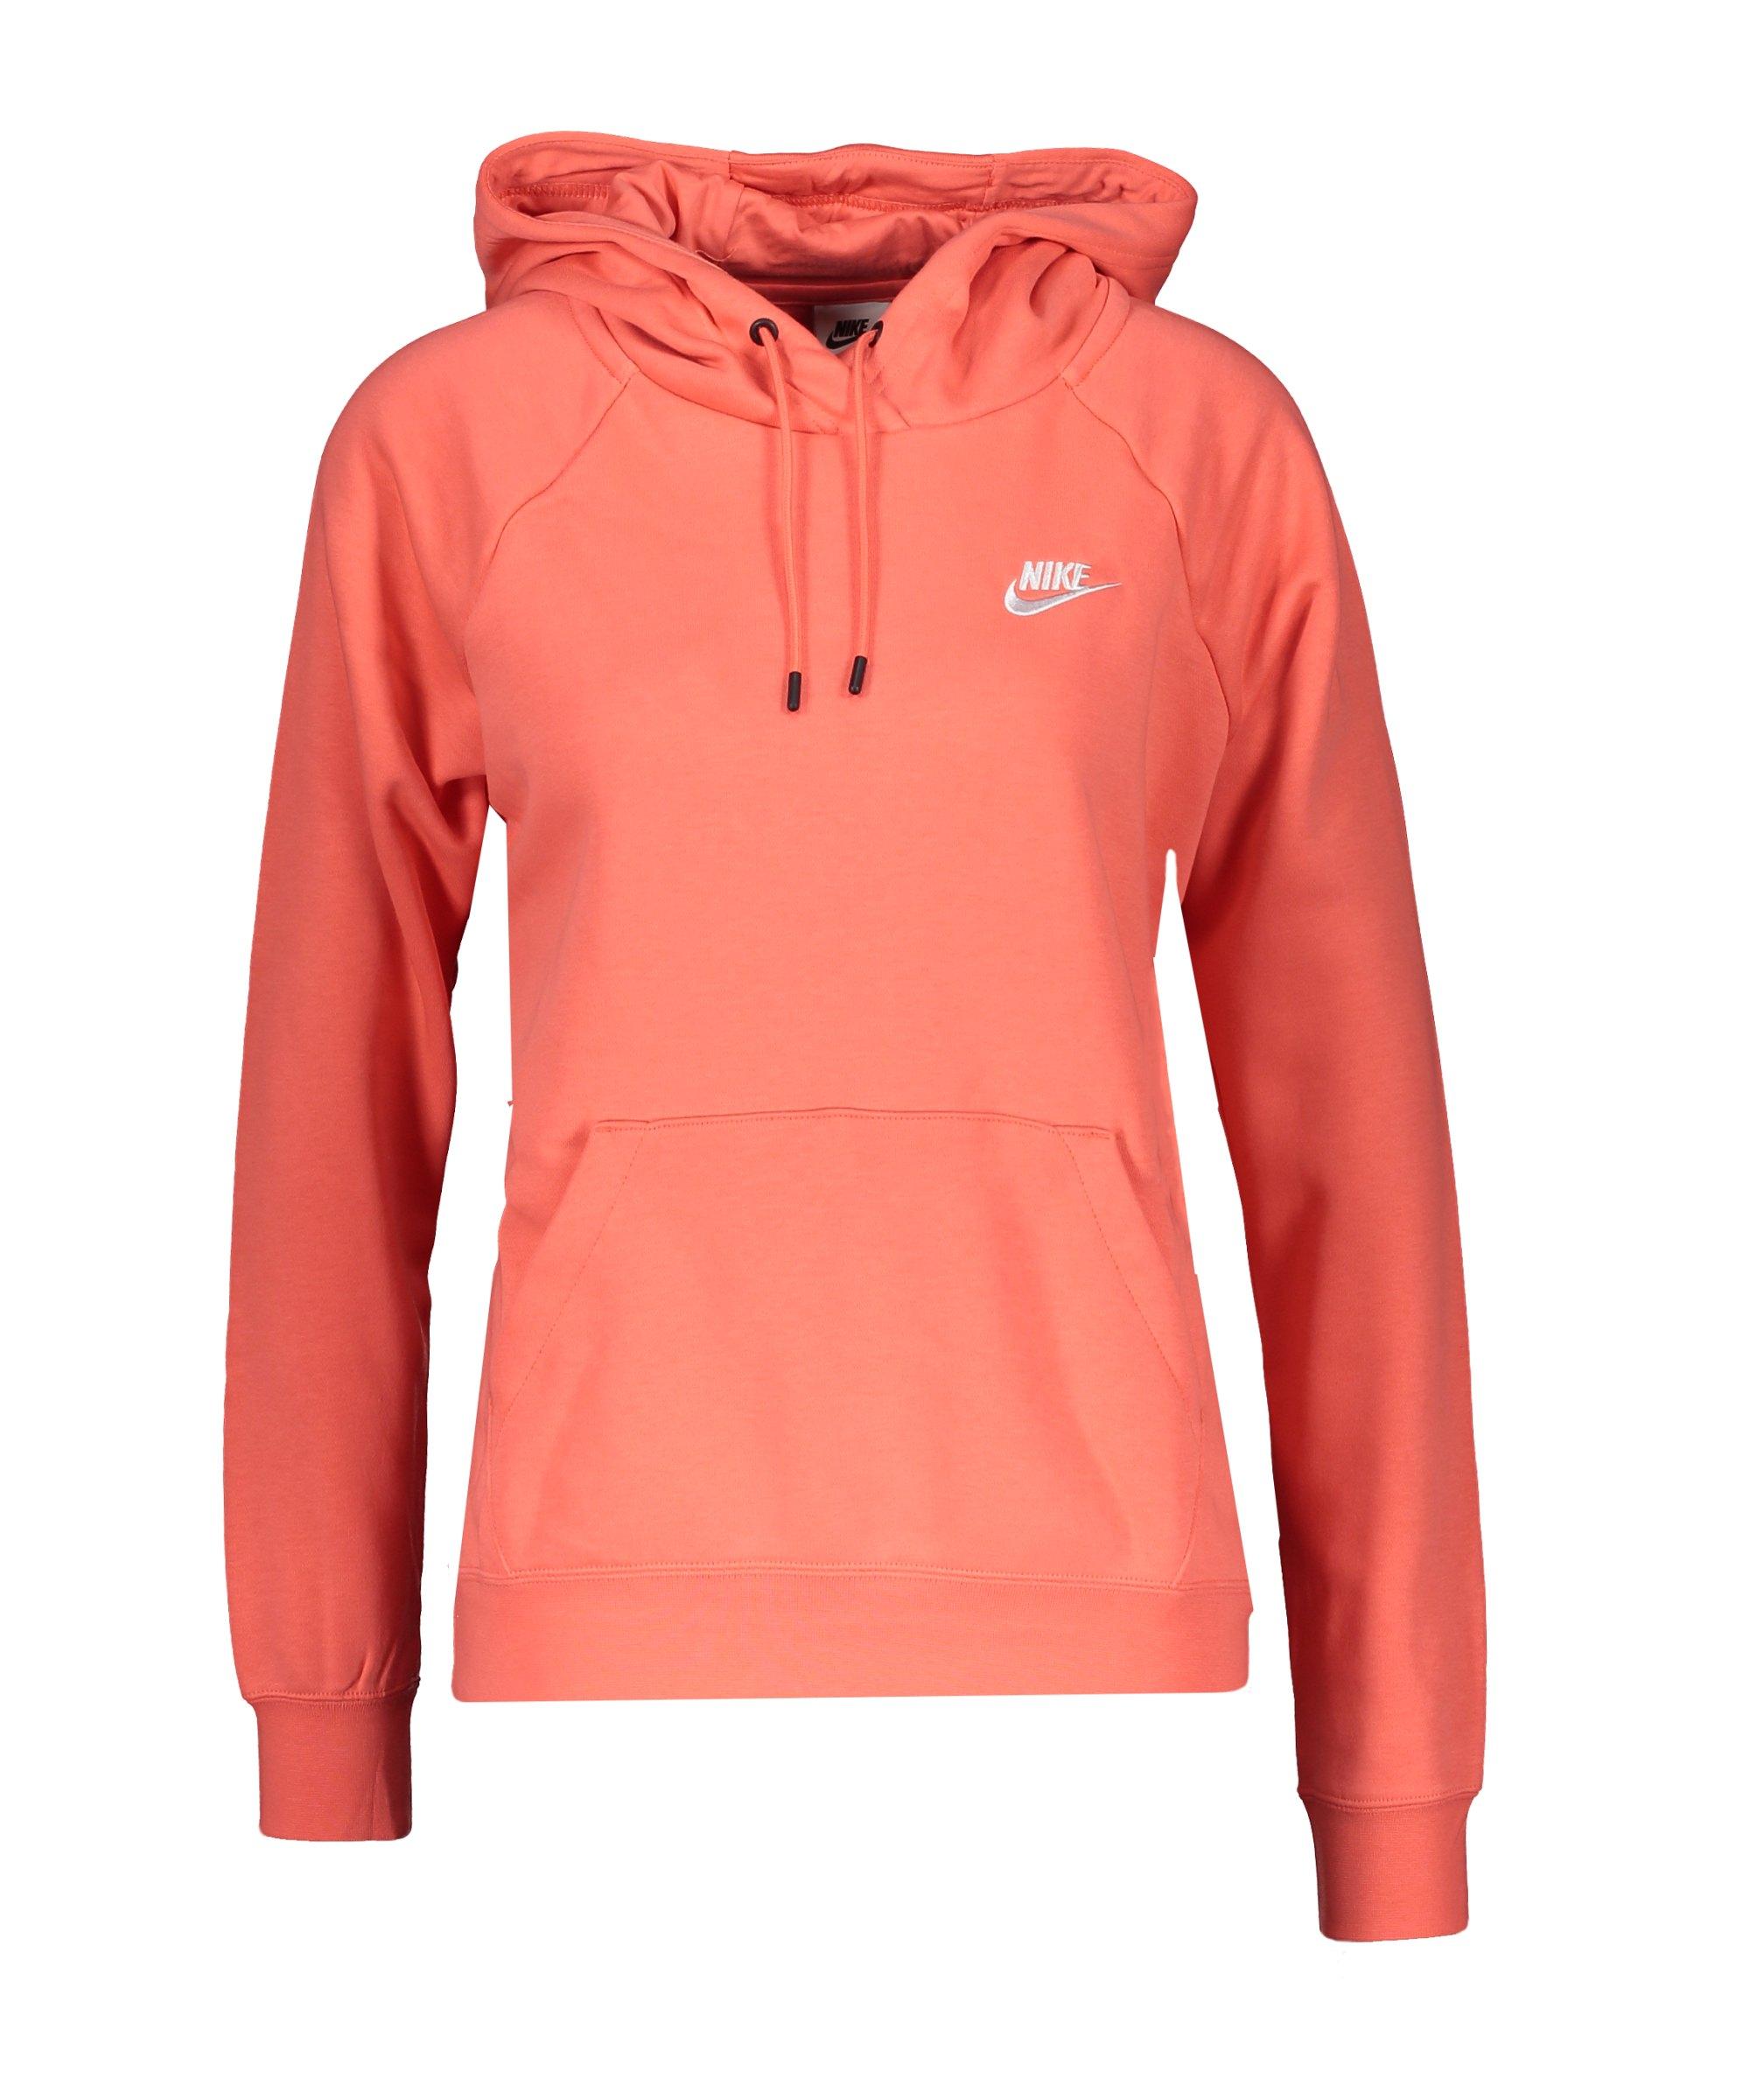 Nike Essential Hoody Damen Orange Weiss F815 - orange